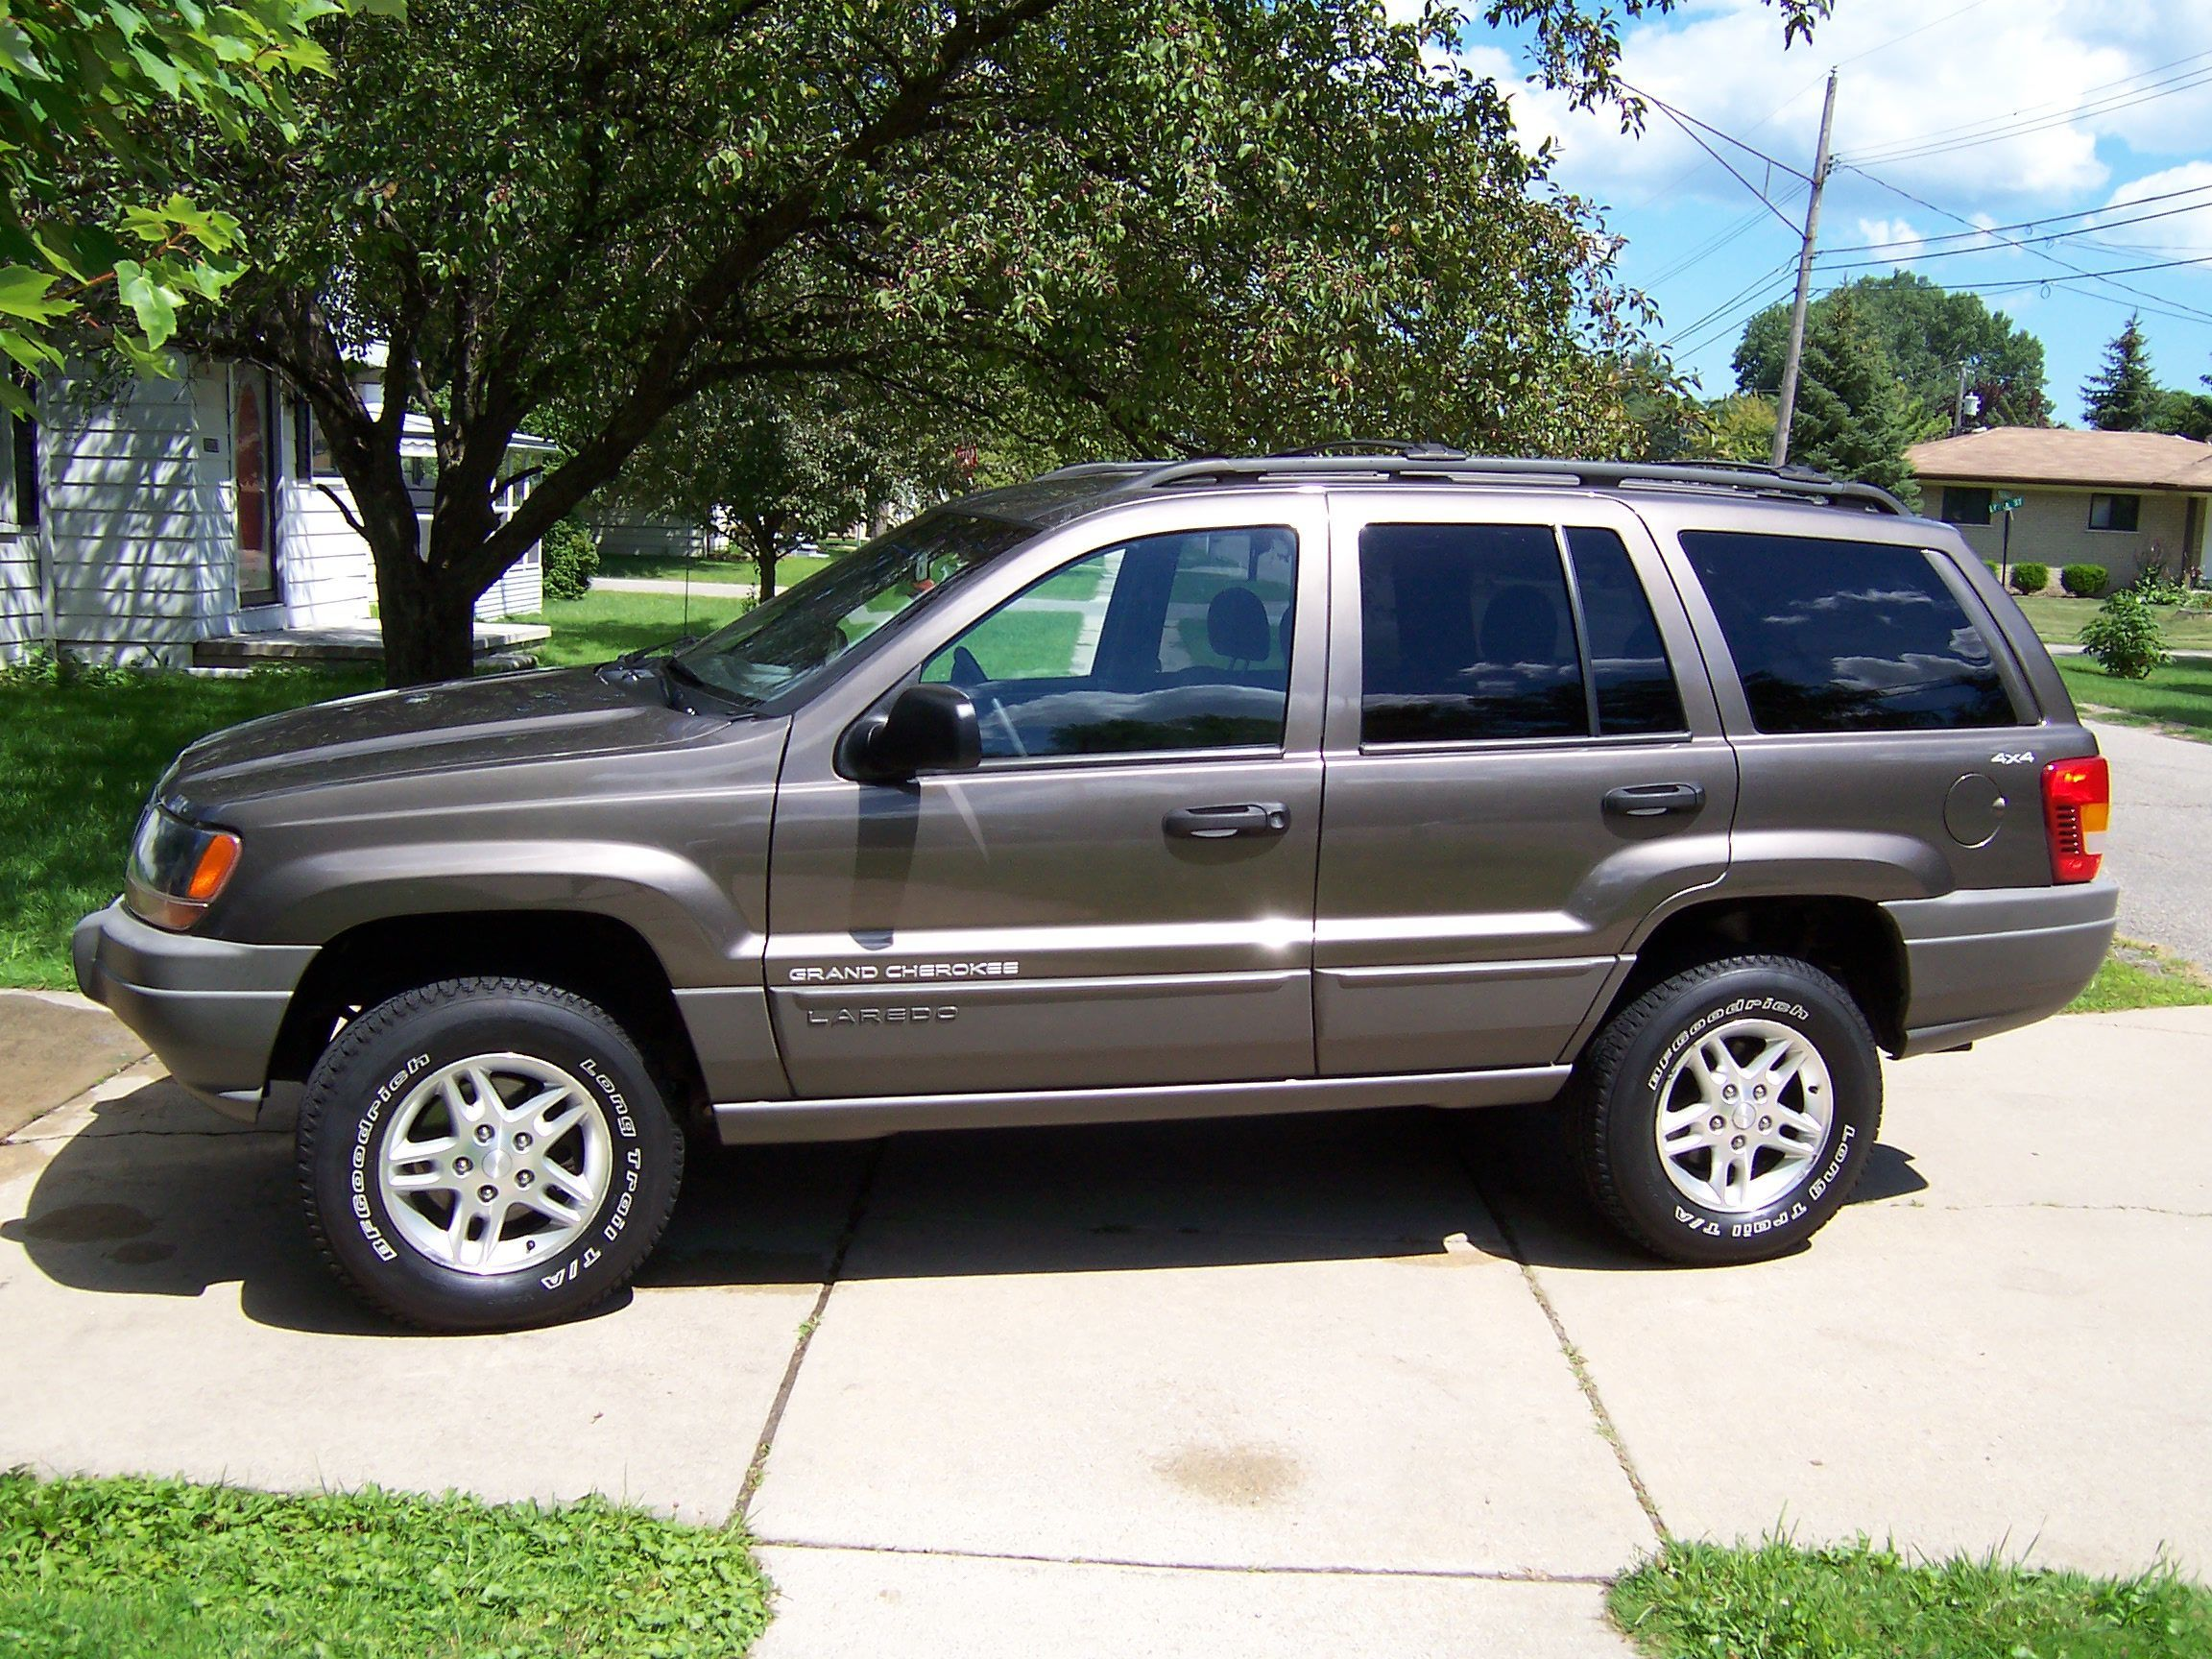 medium resolution of 1999 jeep grand cherokee wj w dana 44 3 73 ratio hydro lok rear and dana 30 front axles